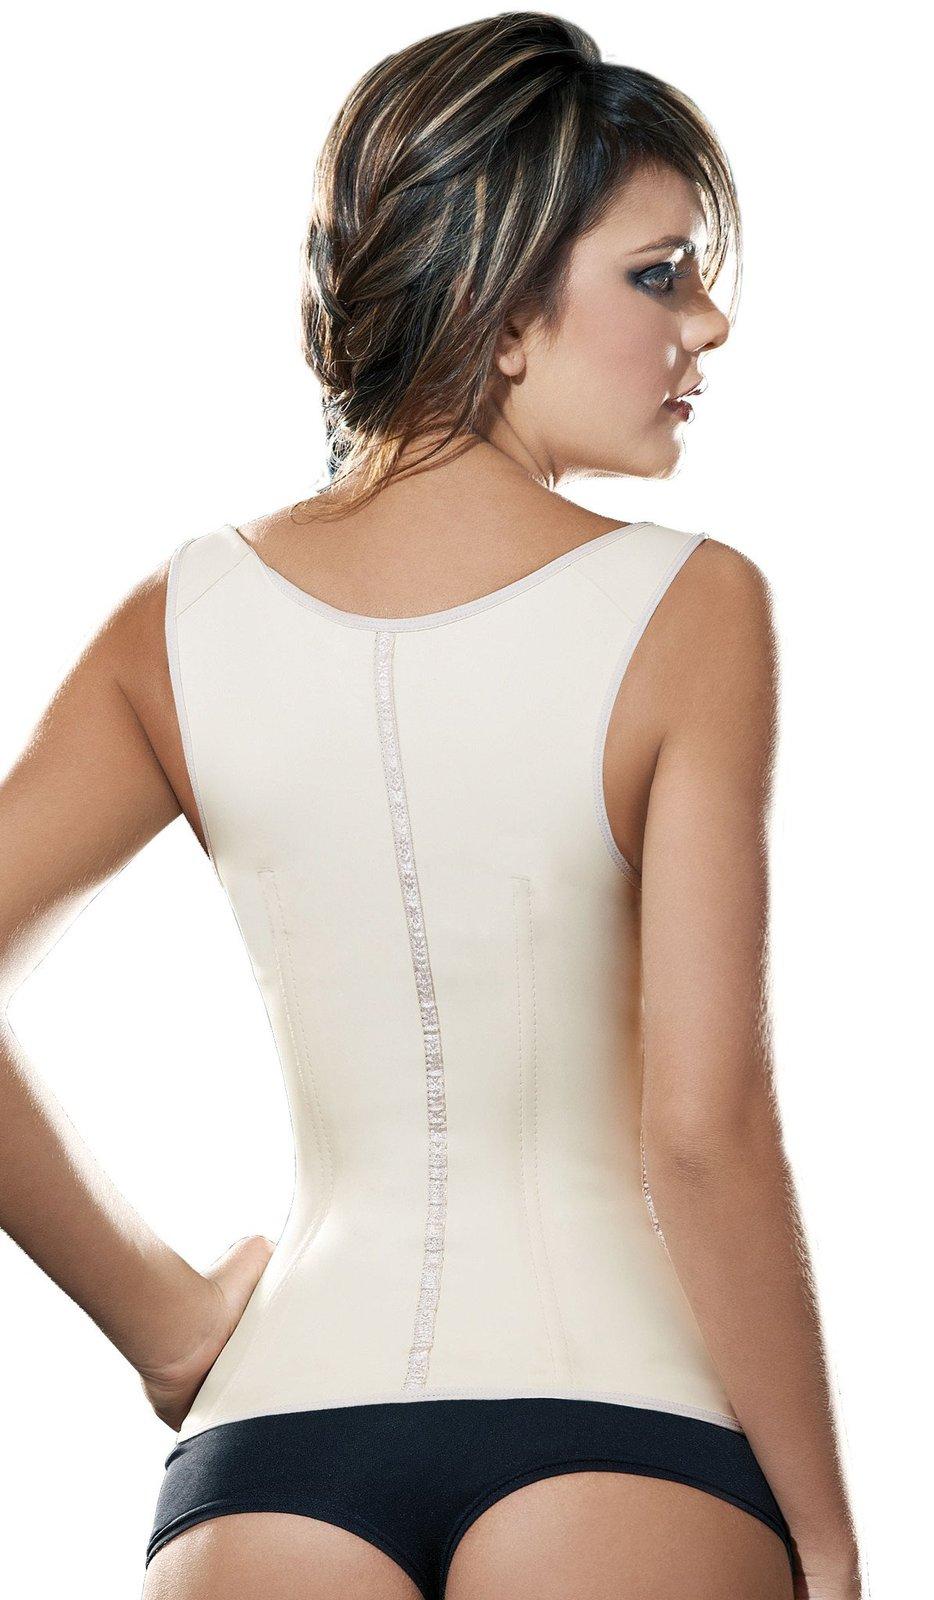 96e44c9f3 Ann Chery Latex Vest   Snatch that Waist   and 45 similar items